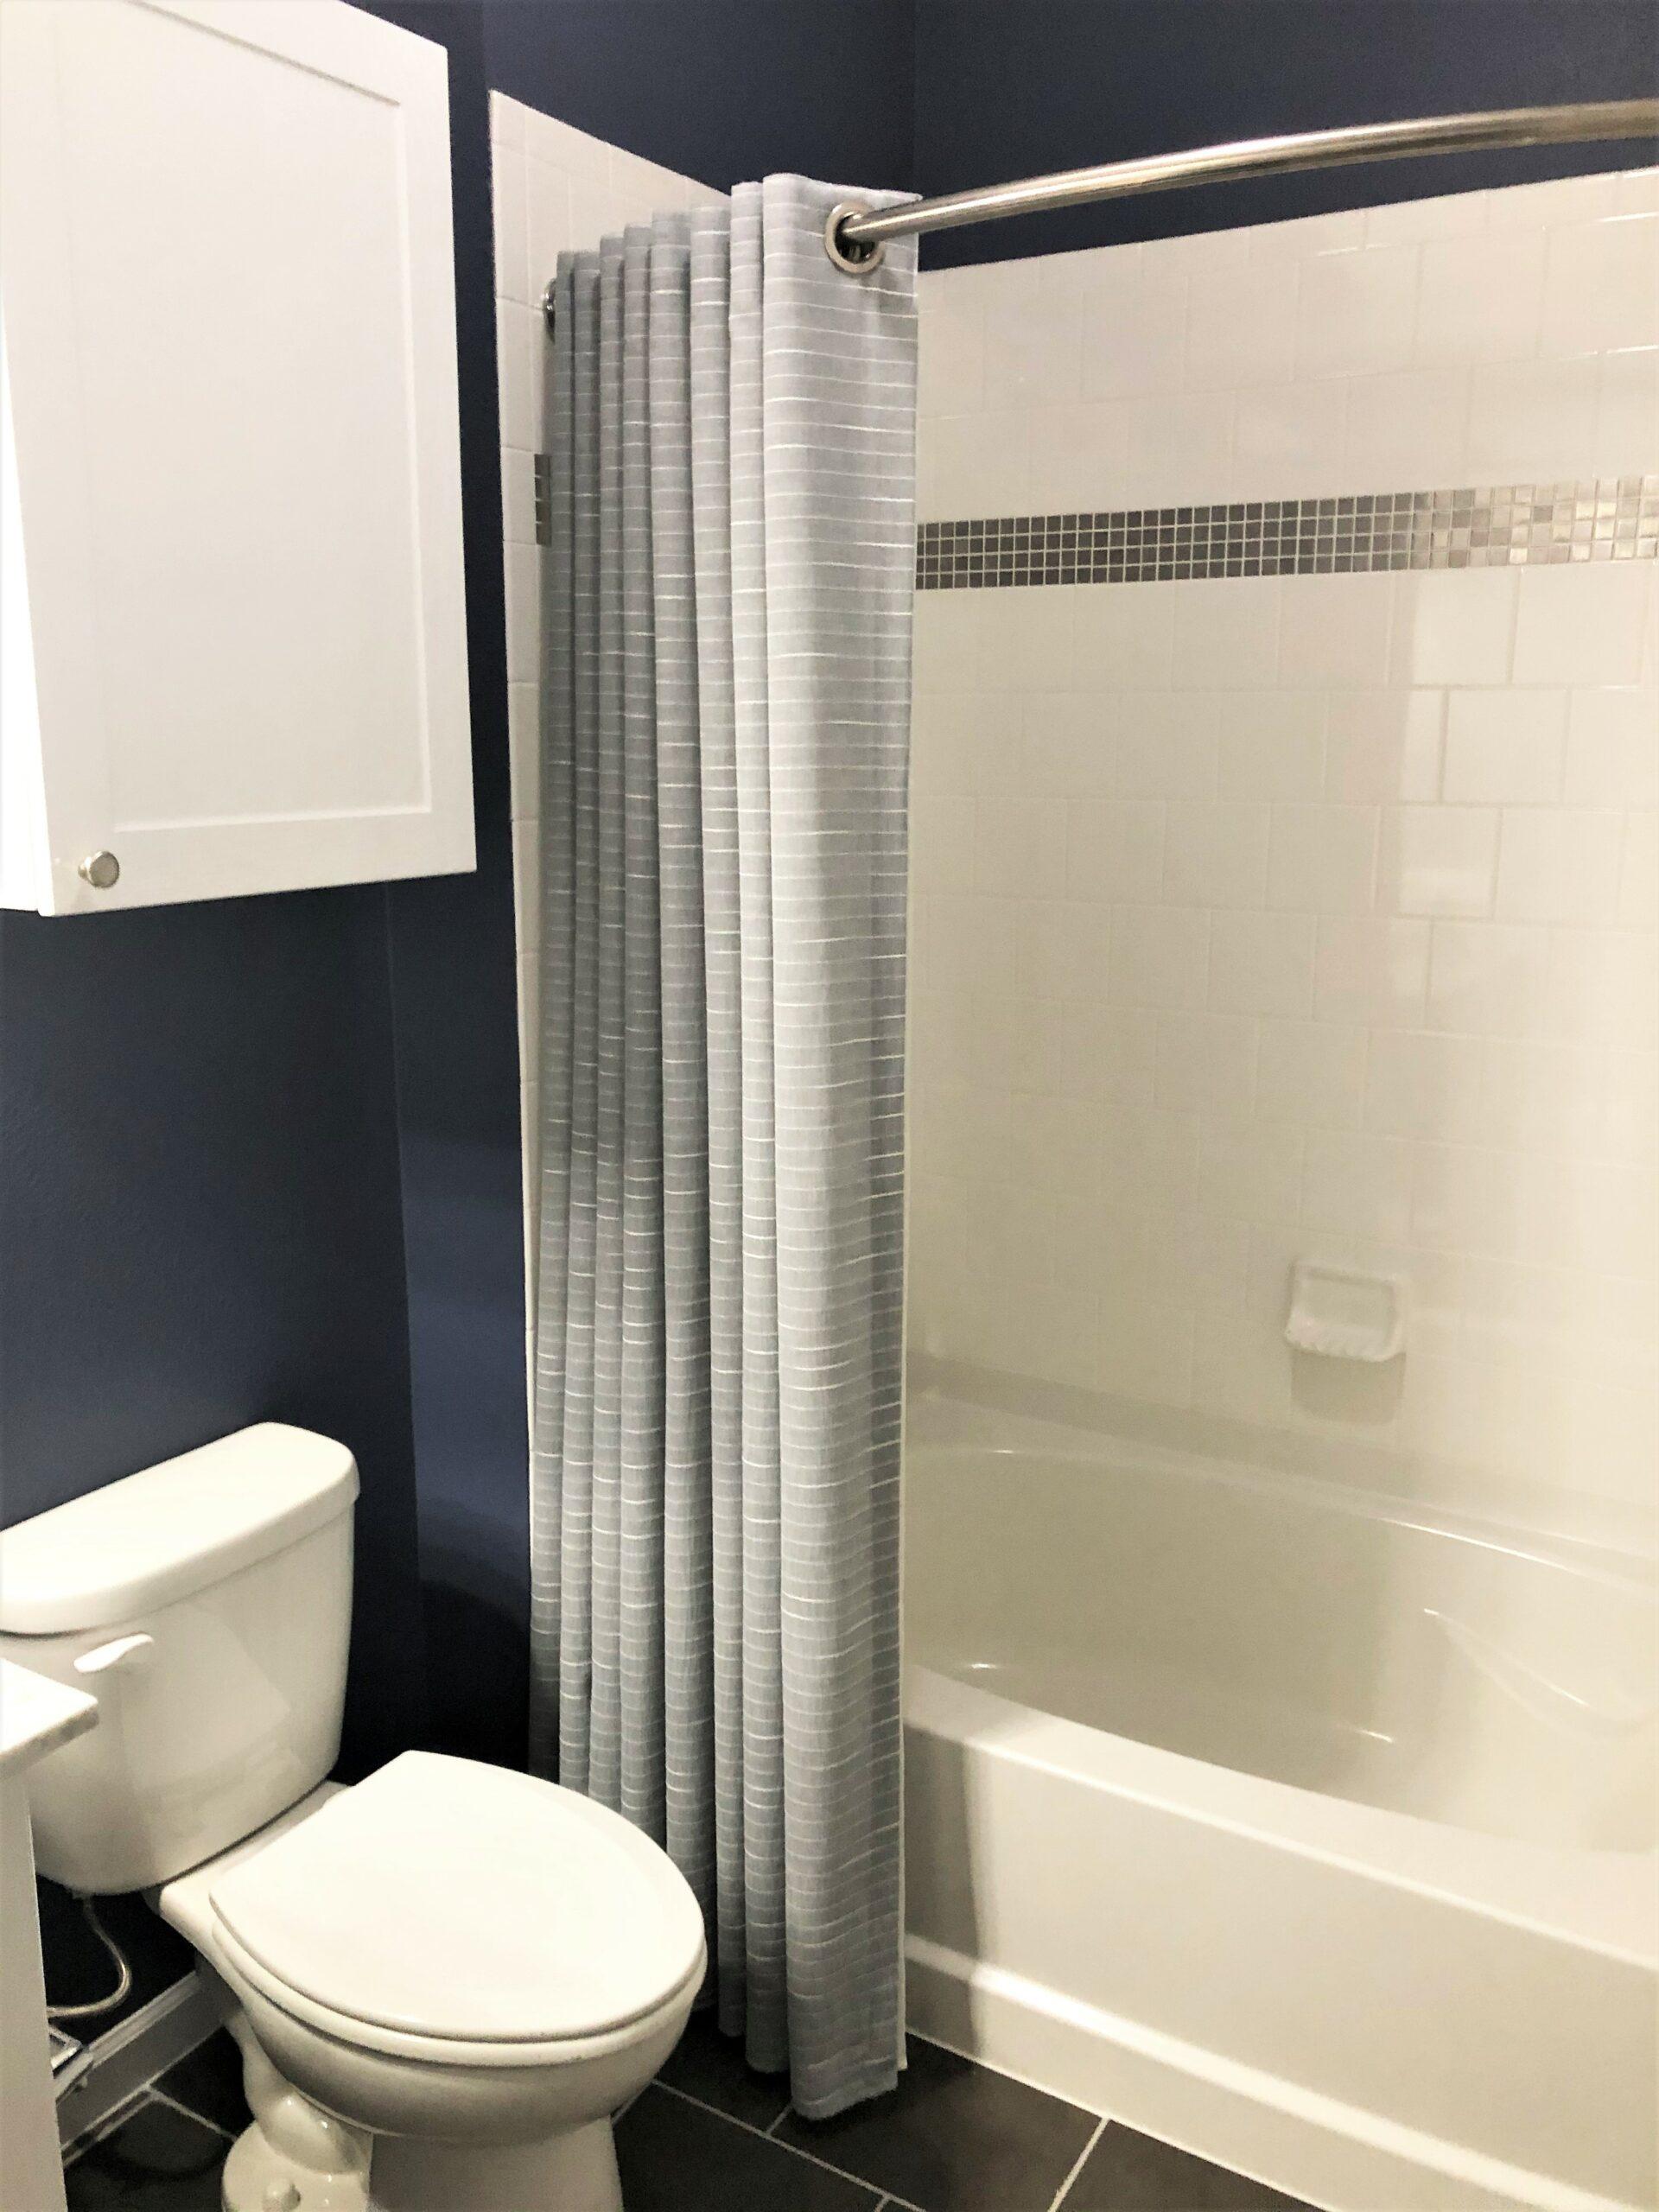 Drapery Designs Bathroom 202103 File 010